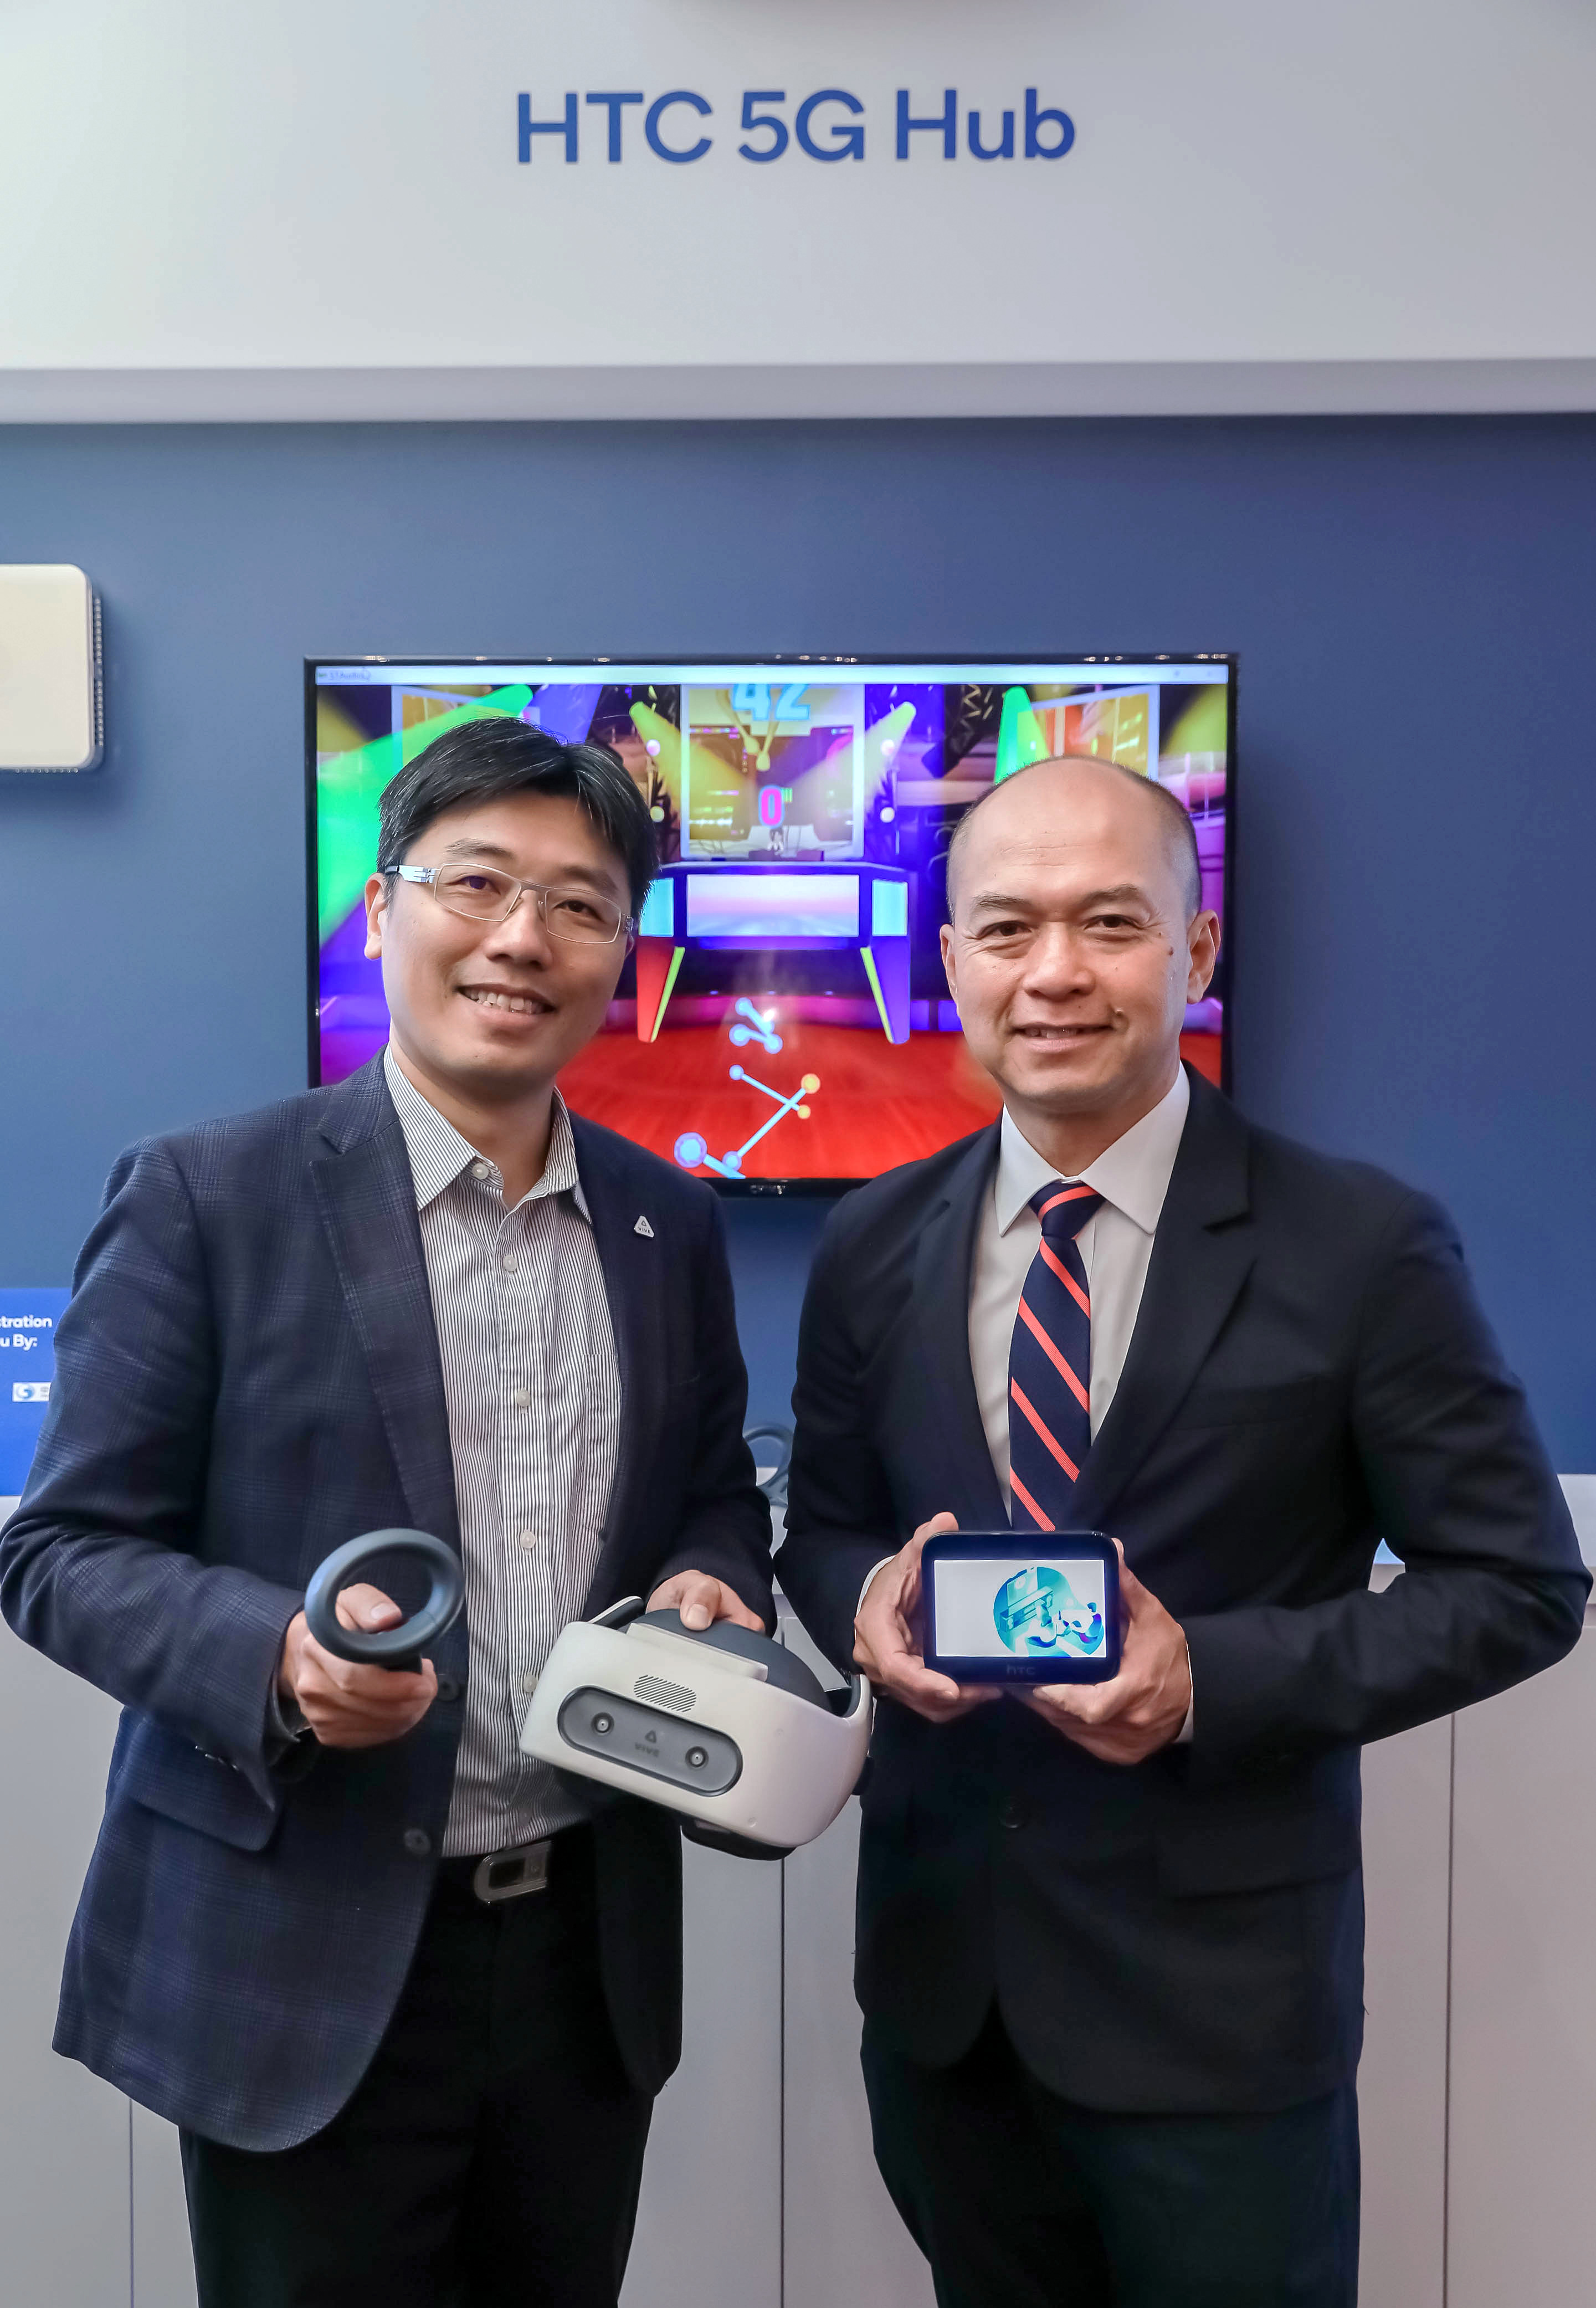 HTC新聞照片(高通副總裁暨台灣與東南亞區總裁劉思泰(右)與HTC全球產品與策略副總經理鮑永哲(左)於COMPUTEX 2019展出實際5G網路垂直應用